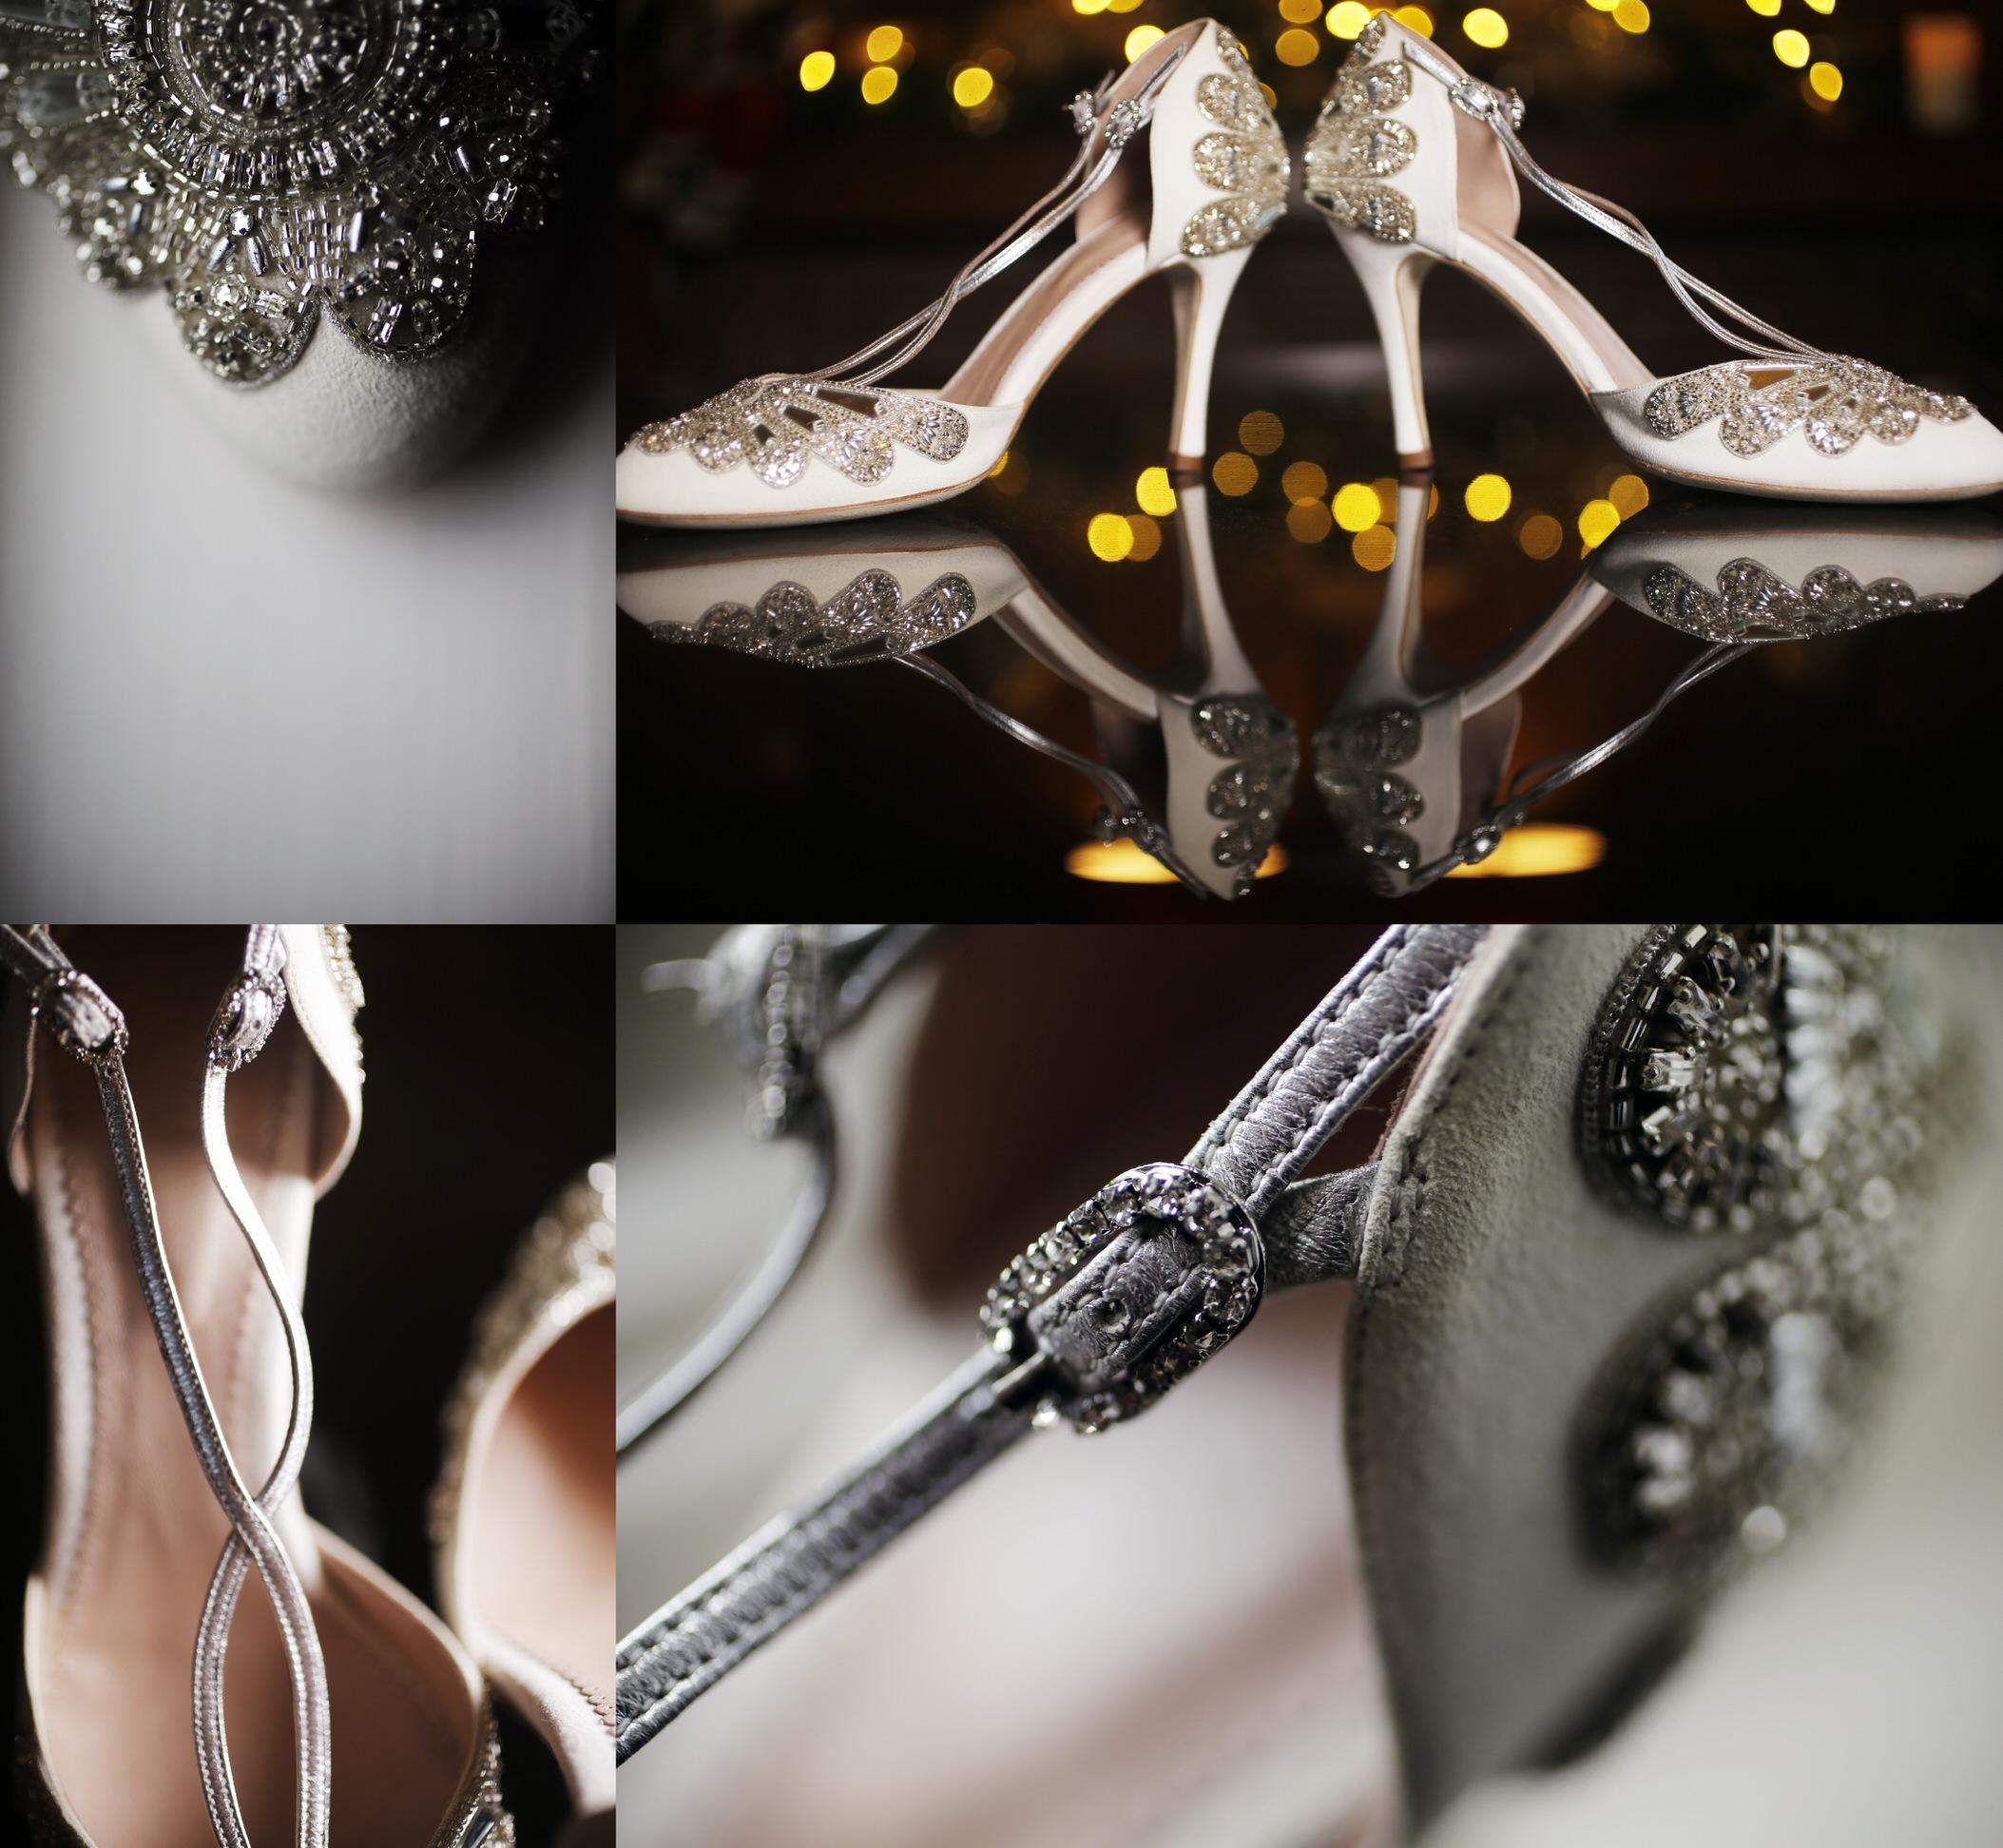 brett-harkness-winter-wedding-uk-wedding-photographer_0002.jpg